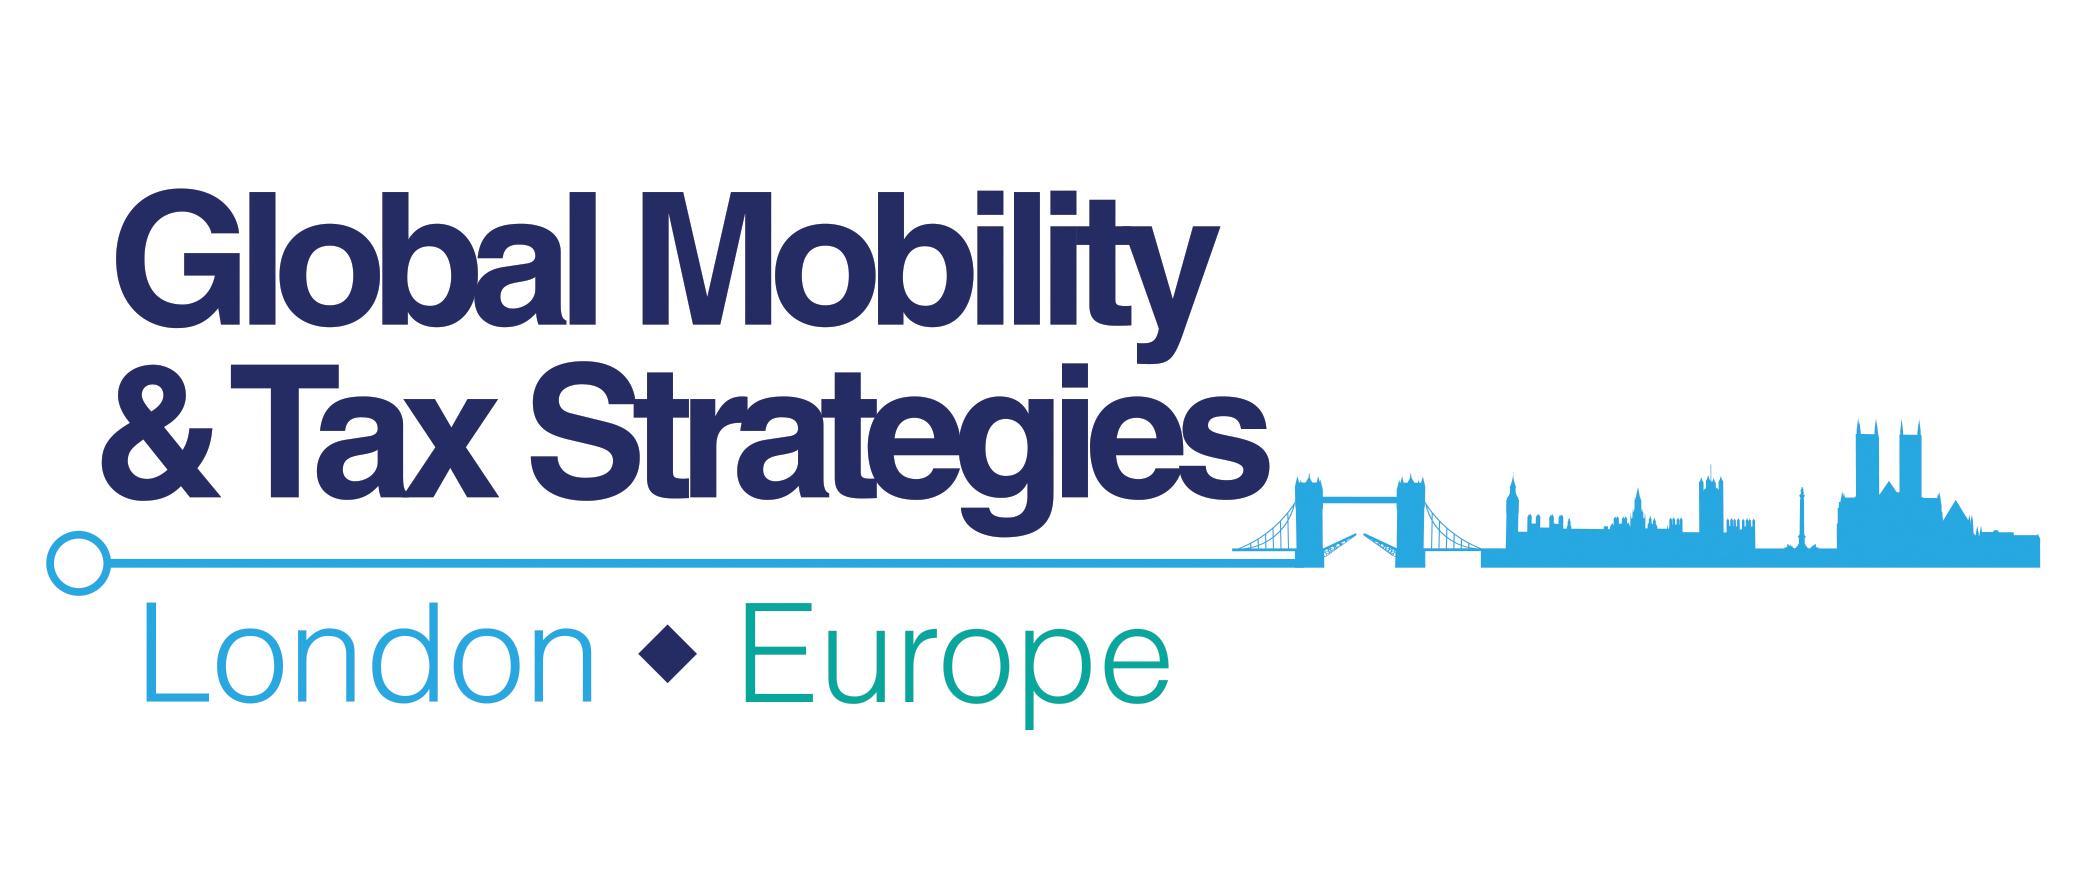 Global Mobility & Tax Strategies London 2017